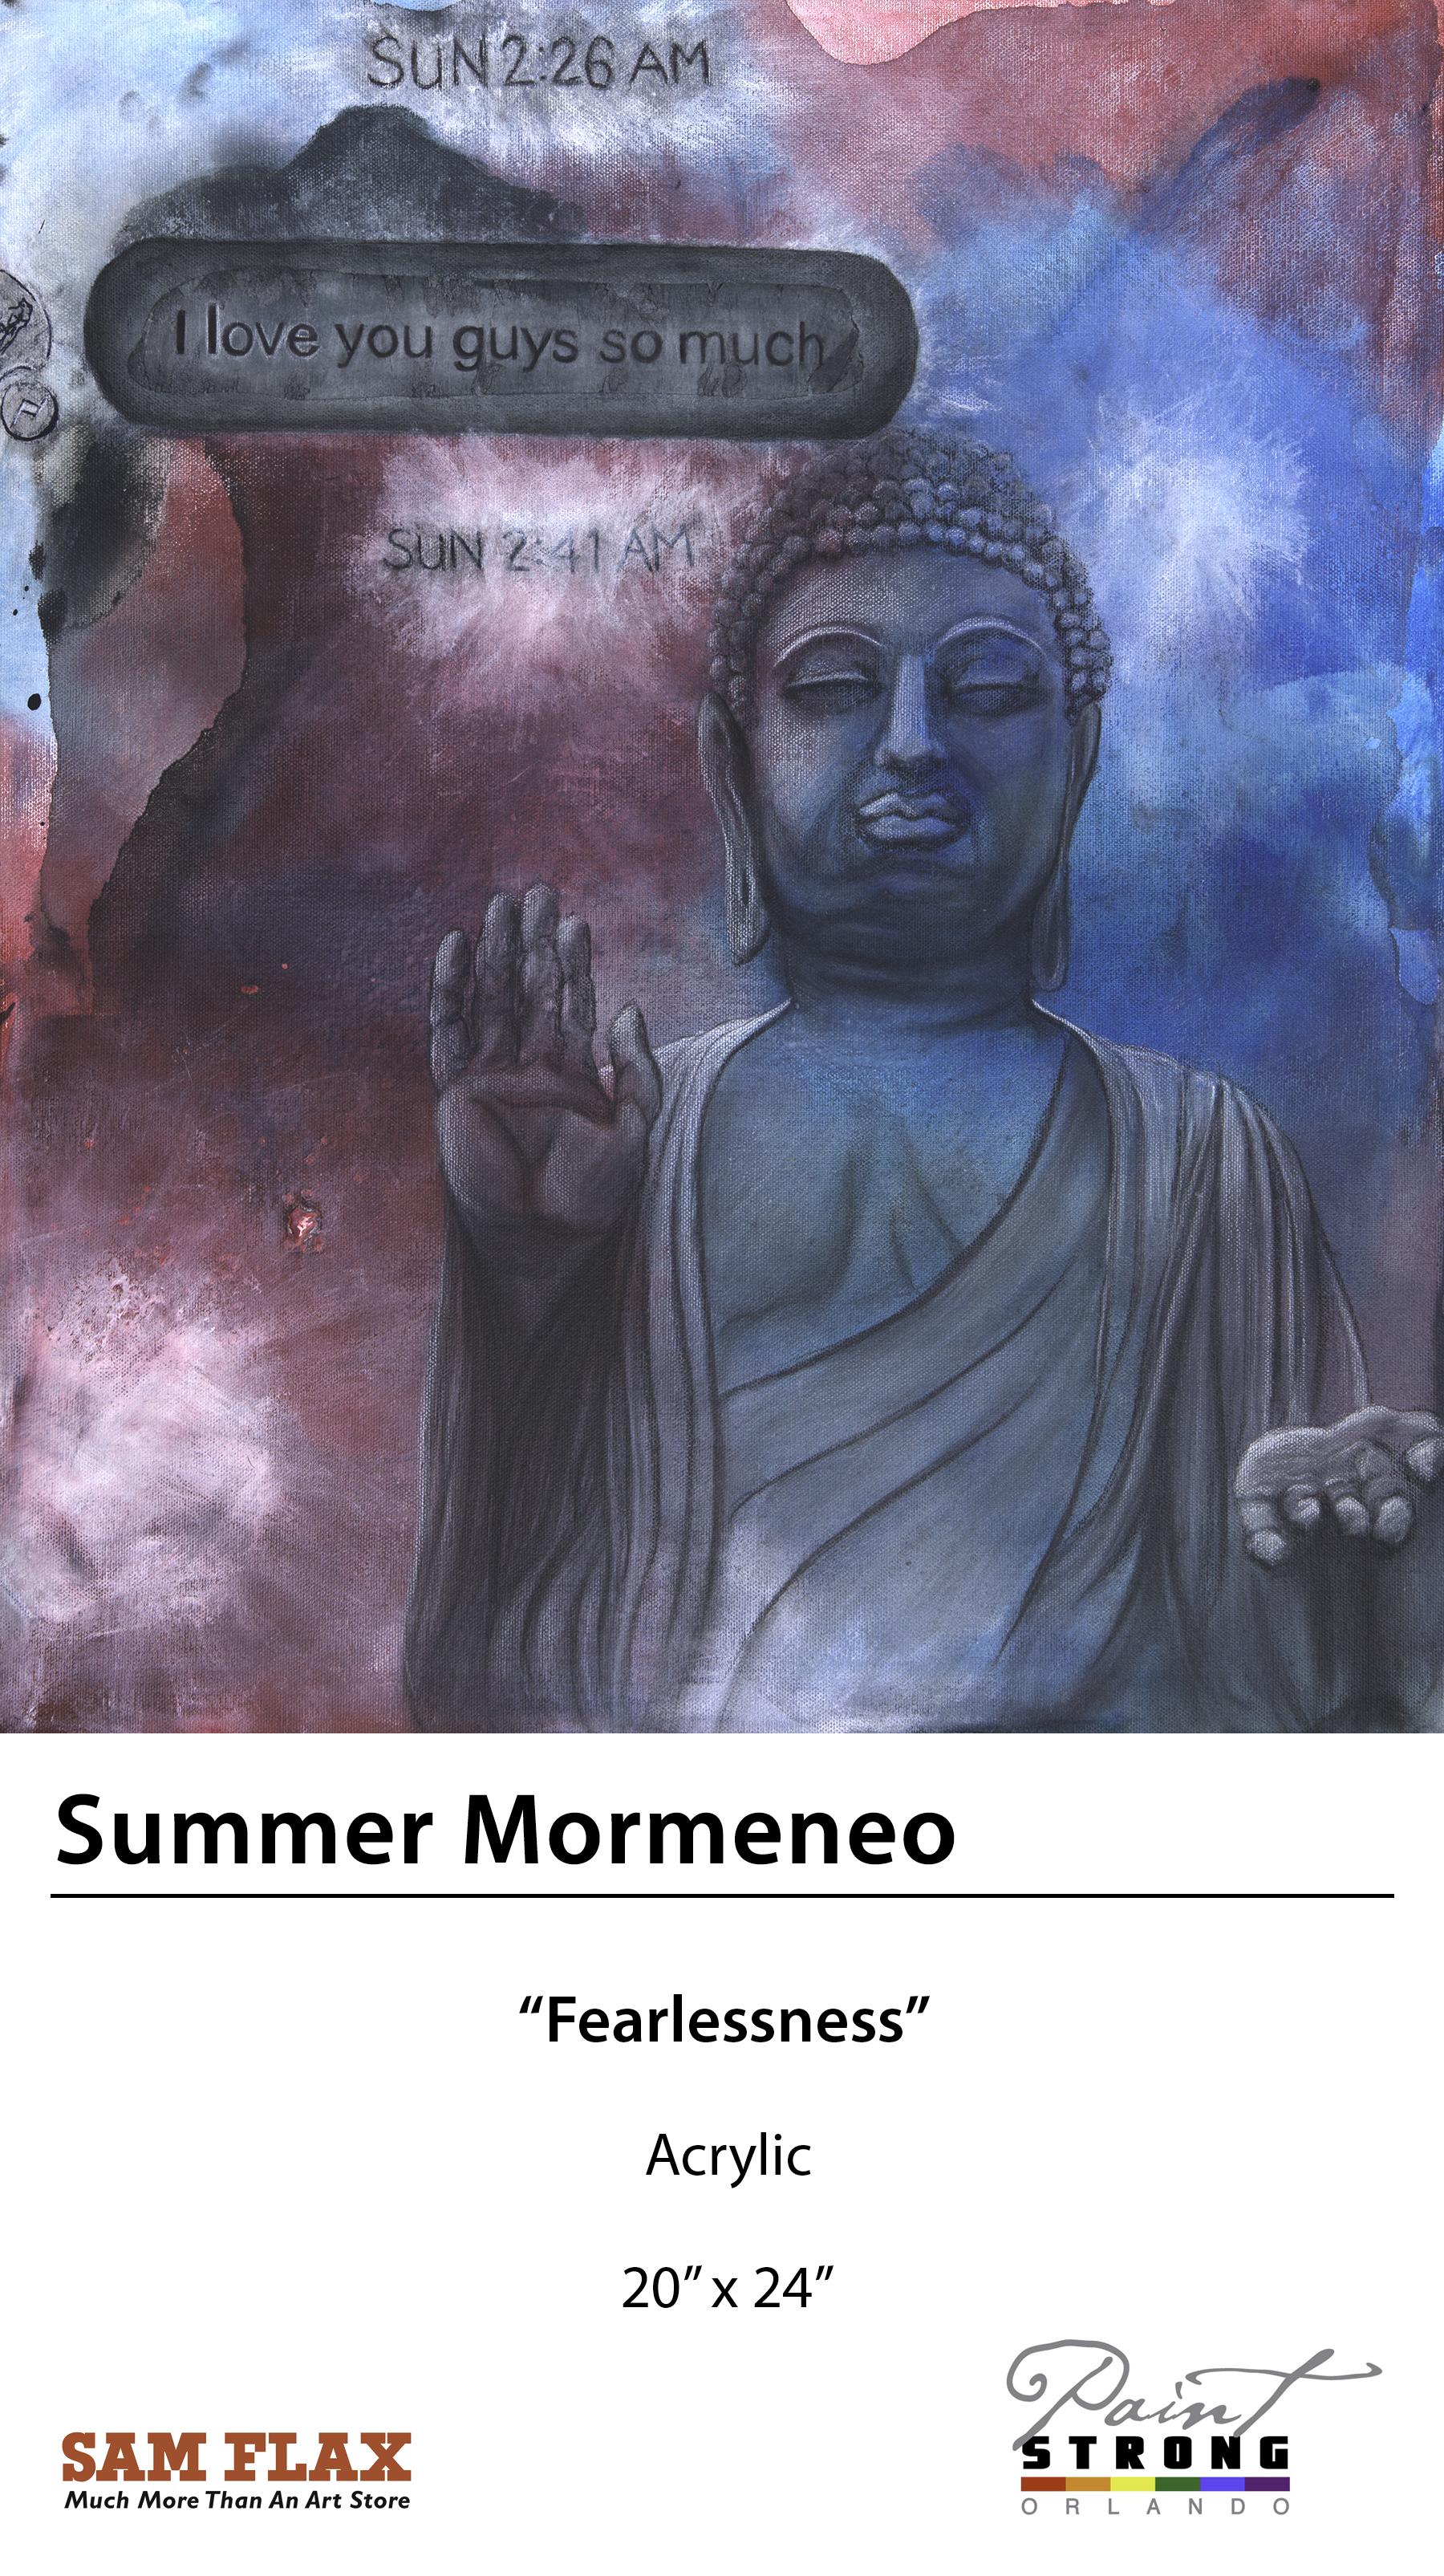 Summer Mormeneo